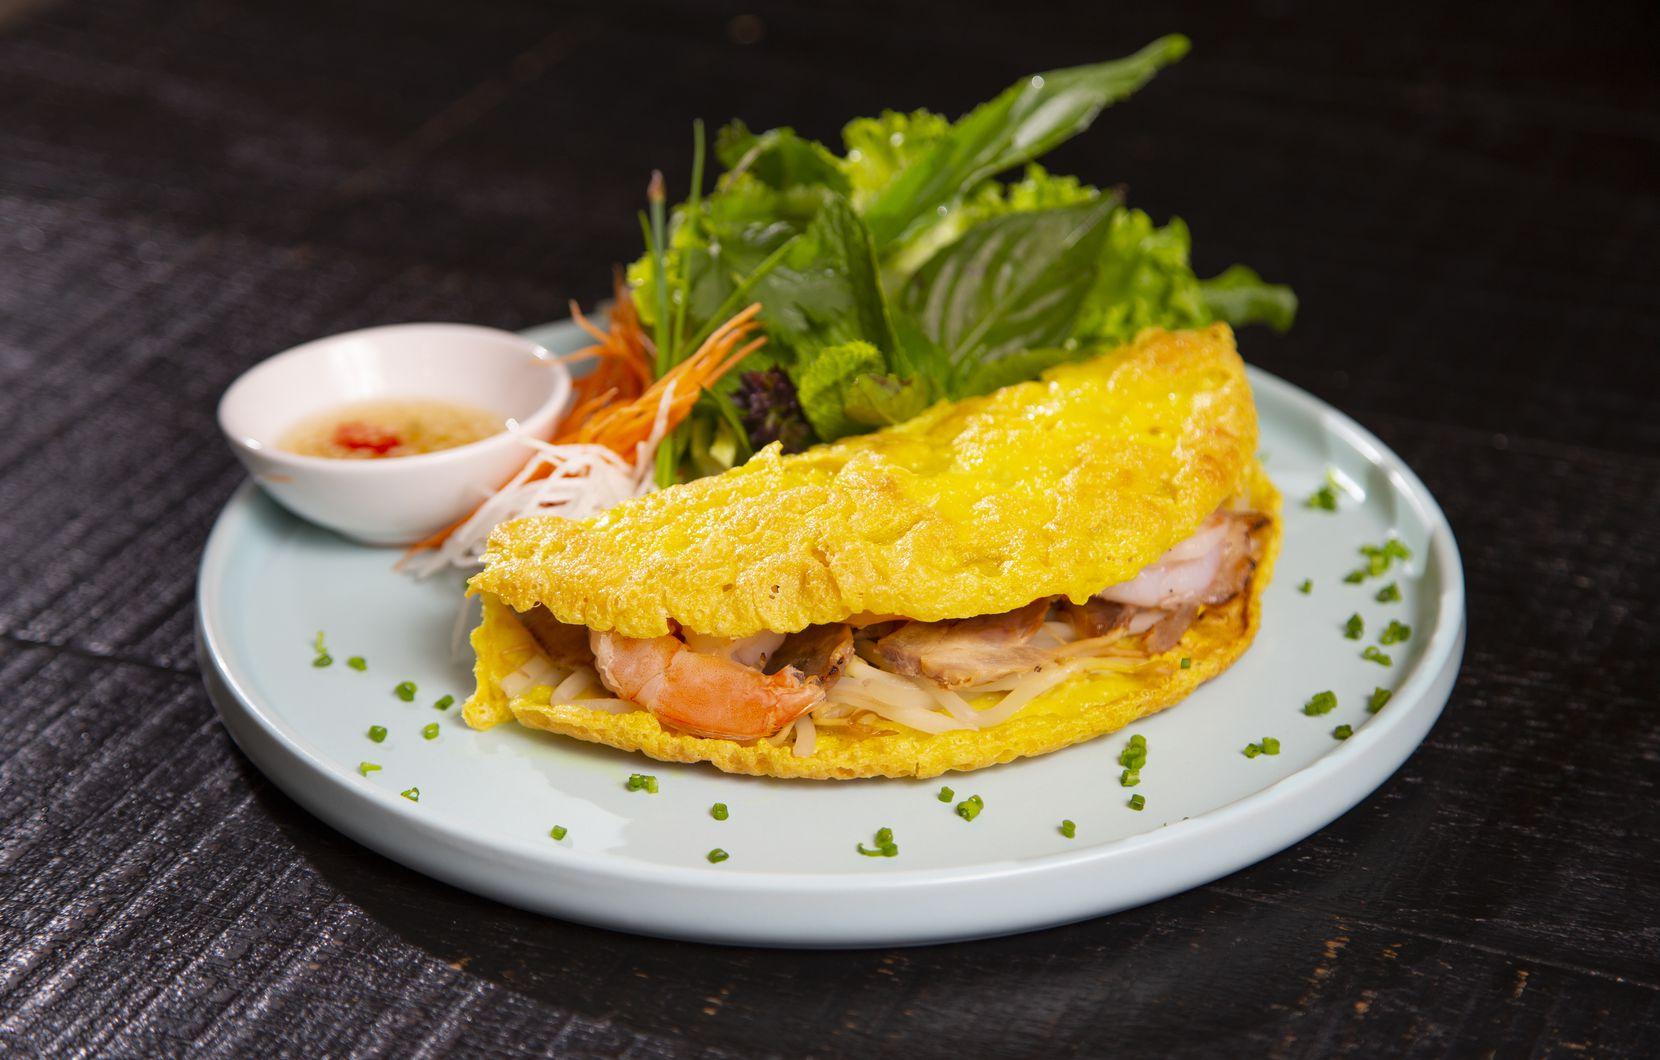 Bánh xèo is a Vietnamese crepe made with shrimp and sliced pork.